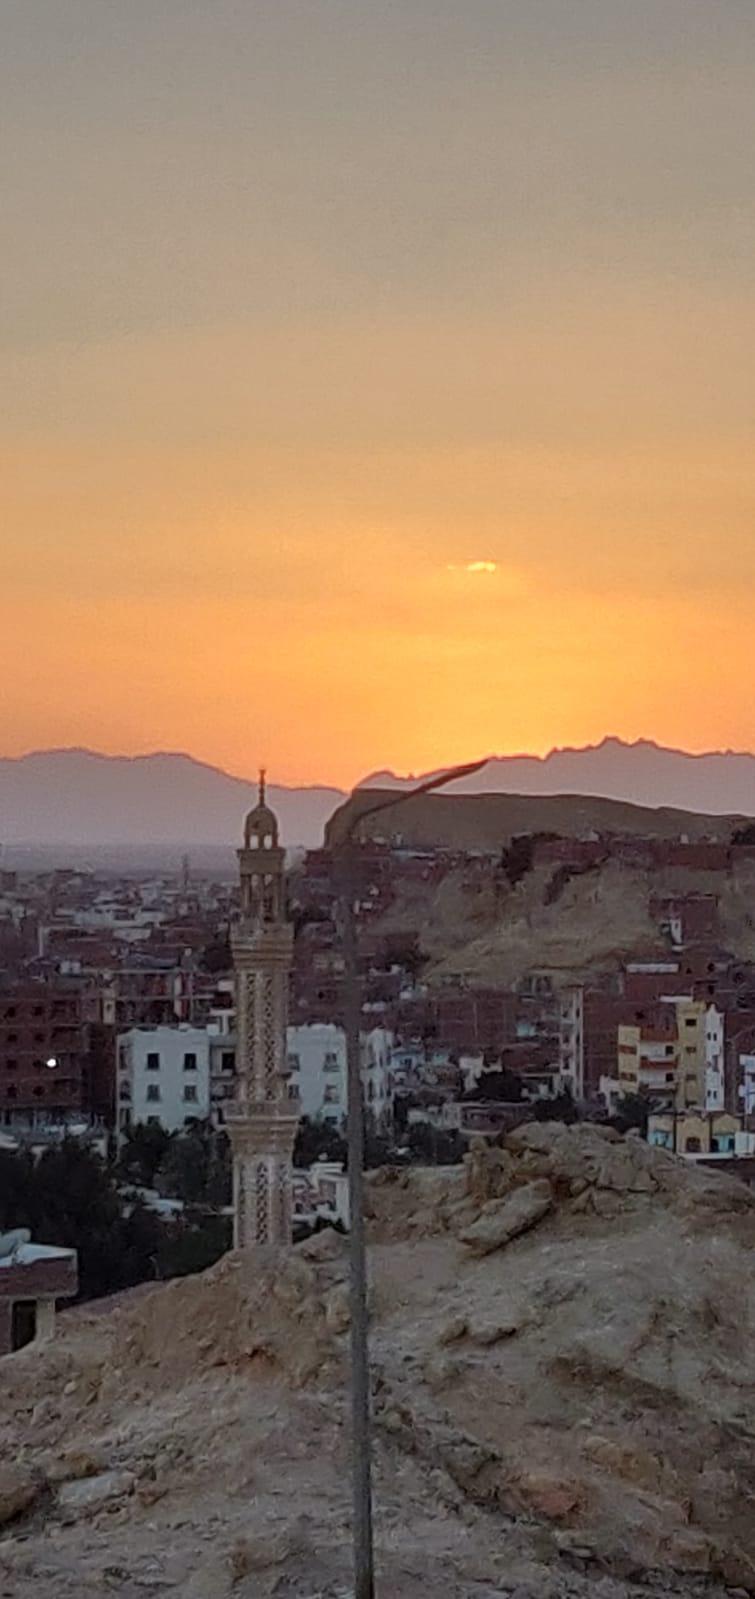 Sunset vom Frauenberg (Hurghada)